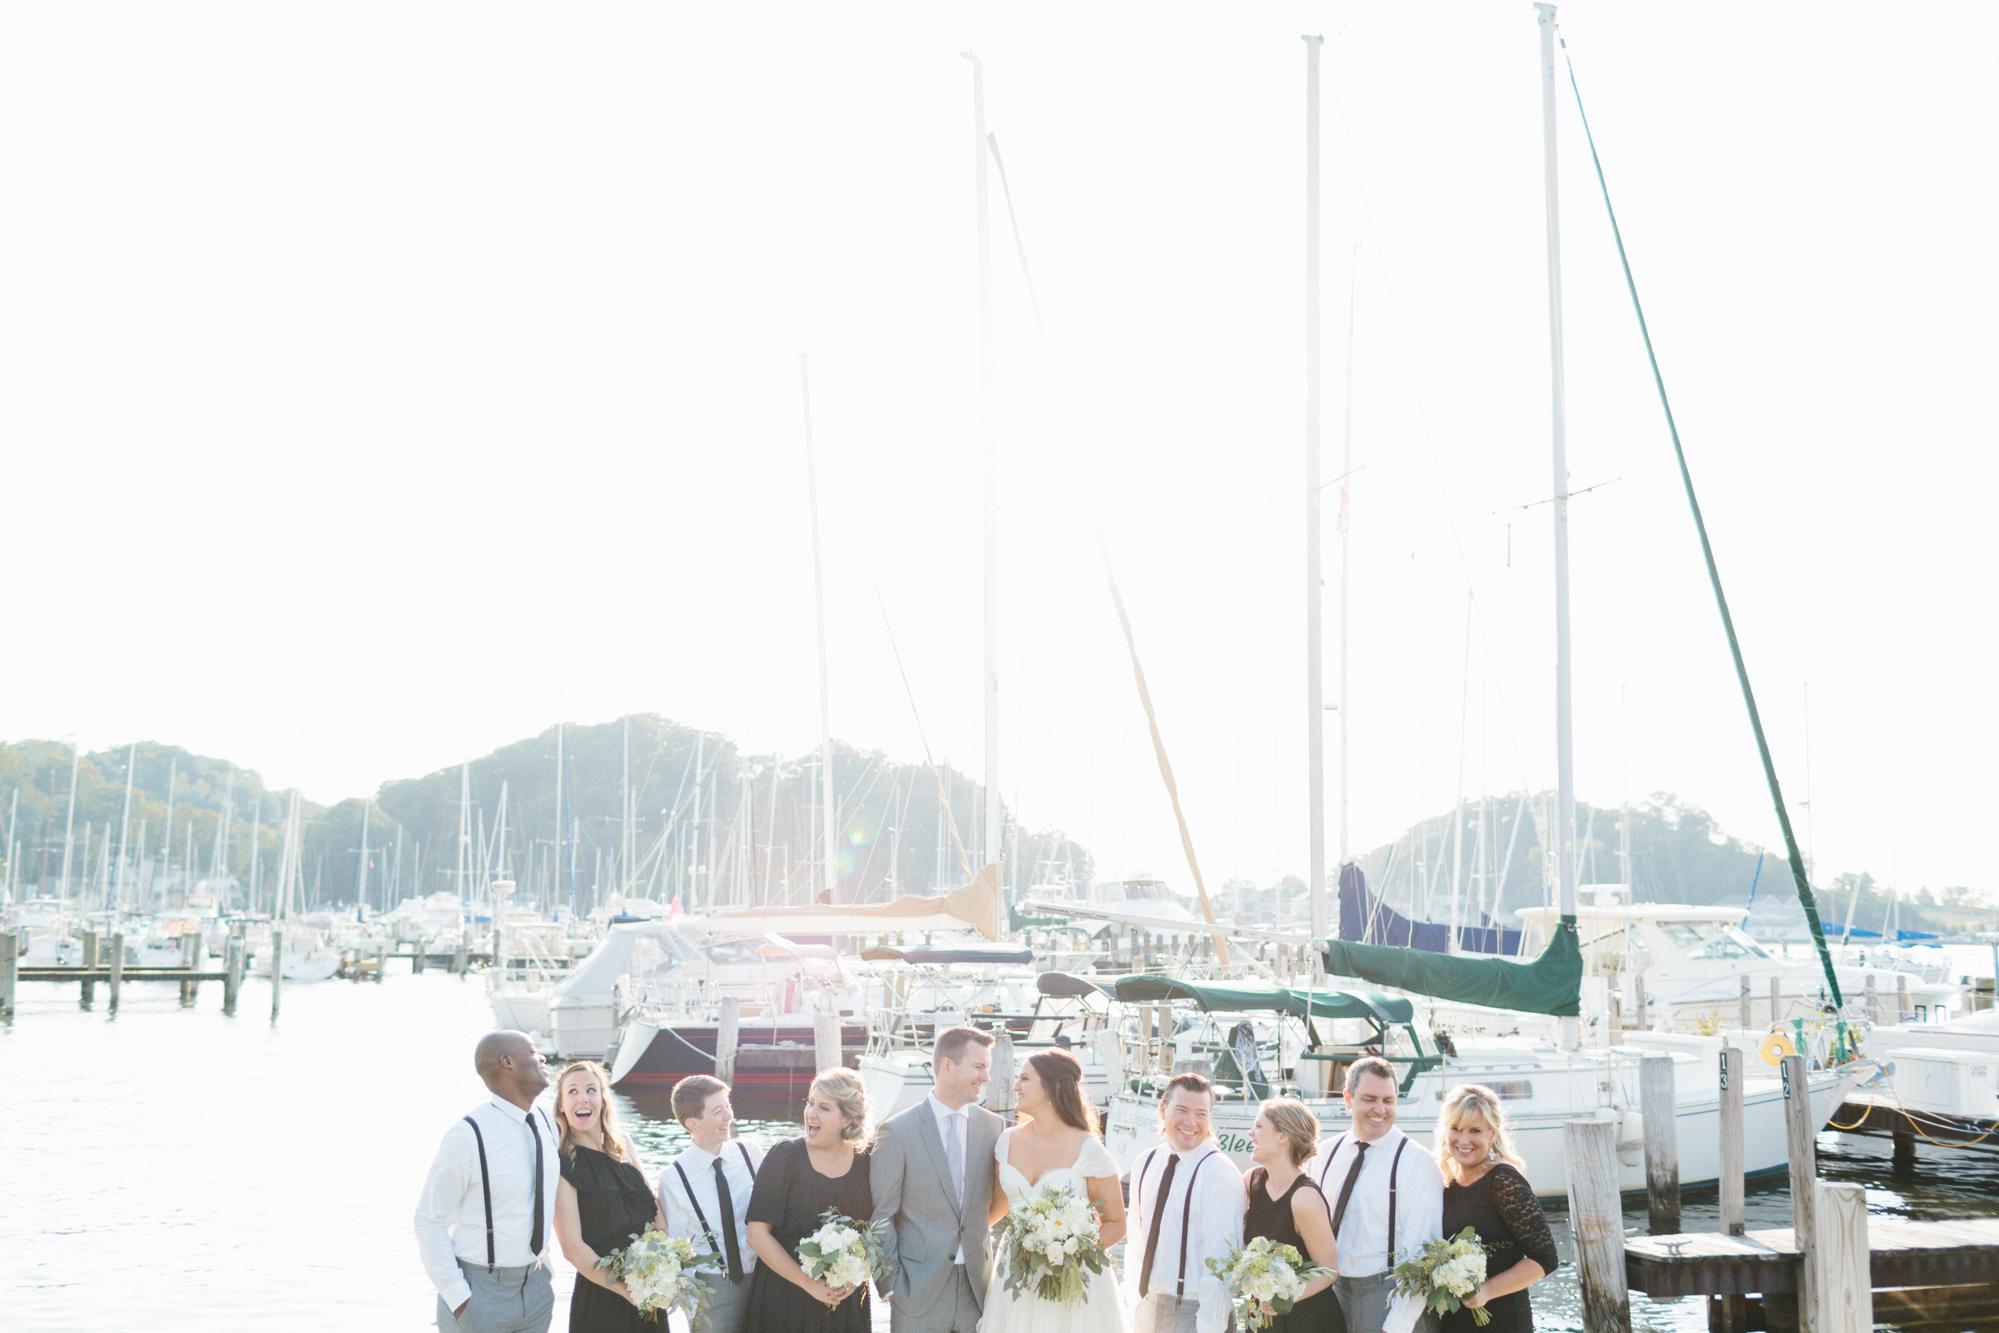 Holland Lake Michigan Wedding Photographer Mae Stier-055.jpg